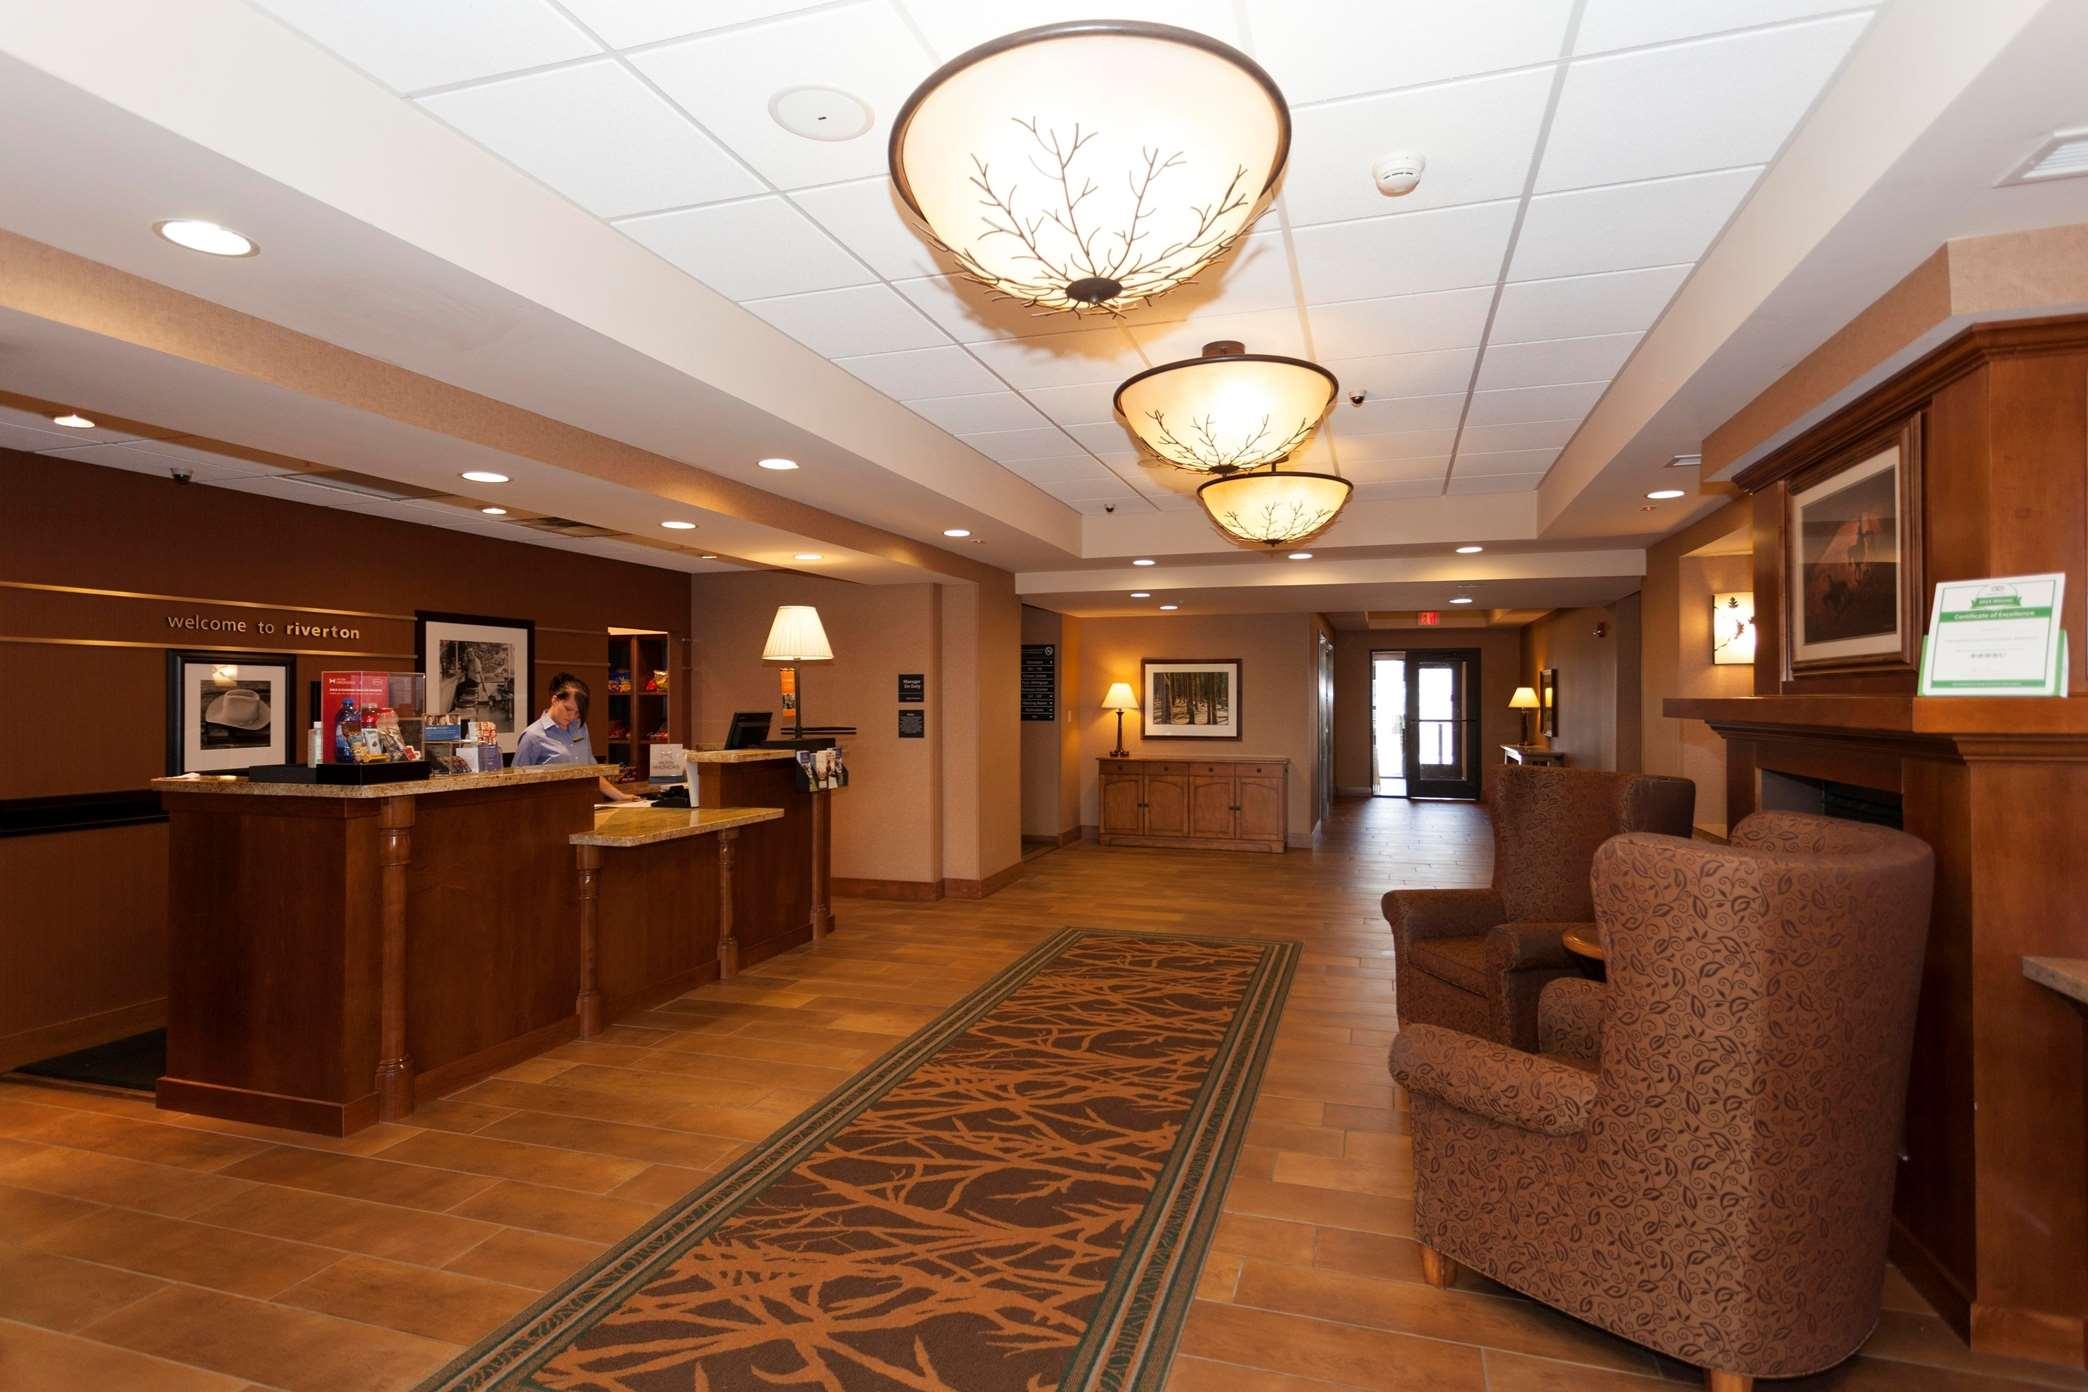 Hampton Inn & Suites Riverton image 27